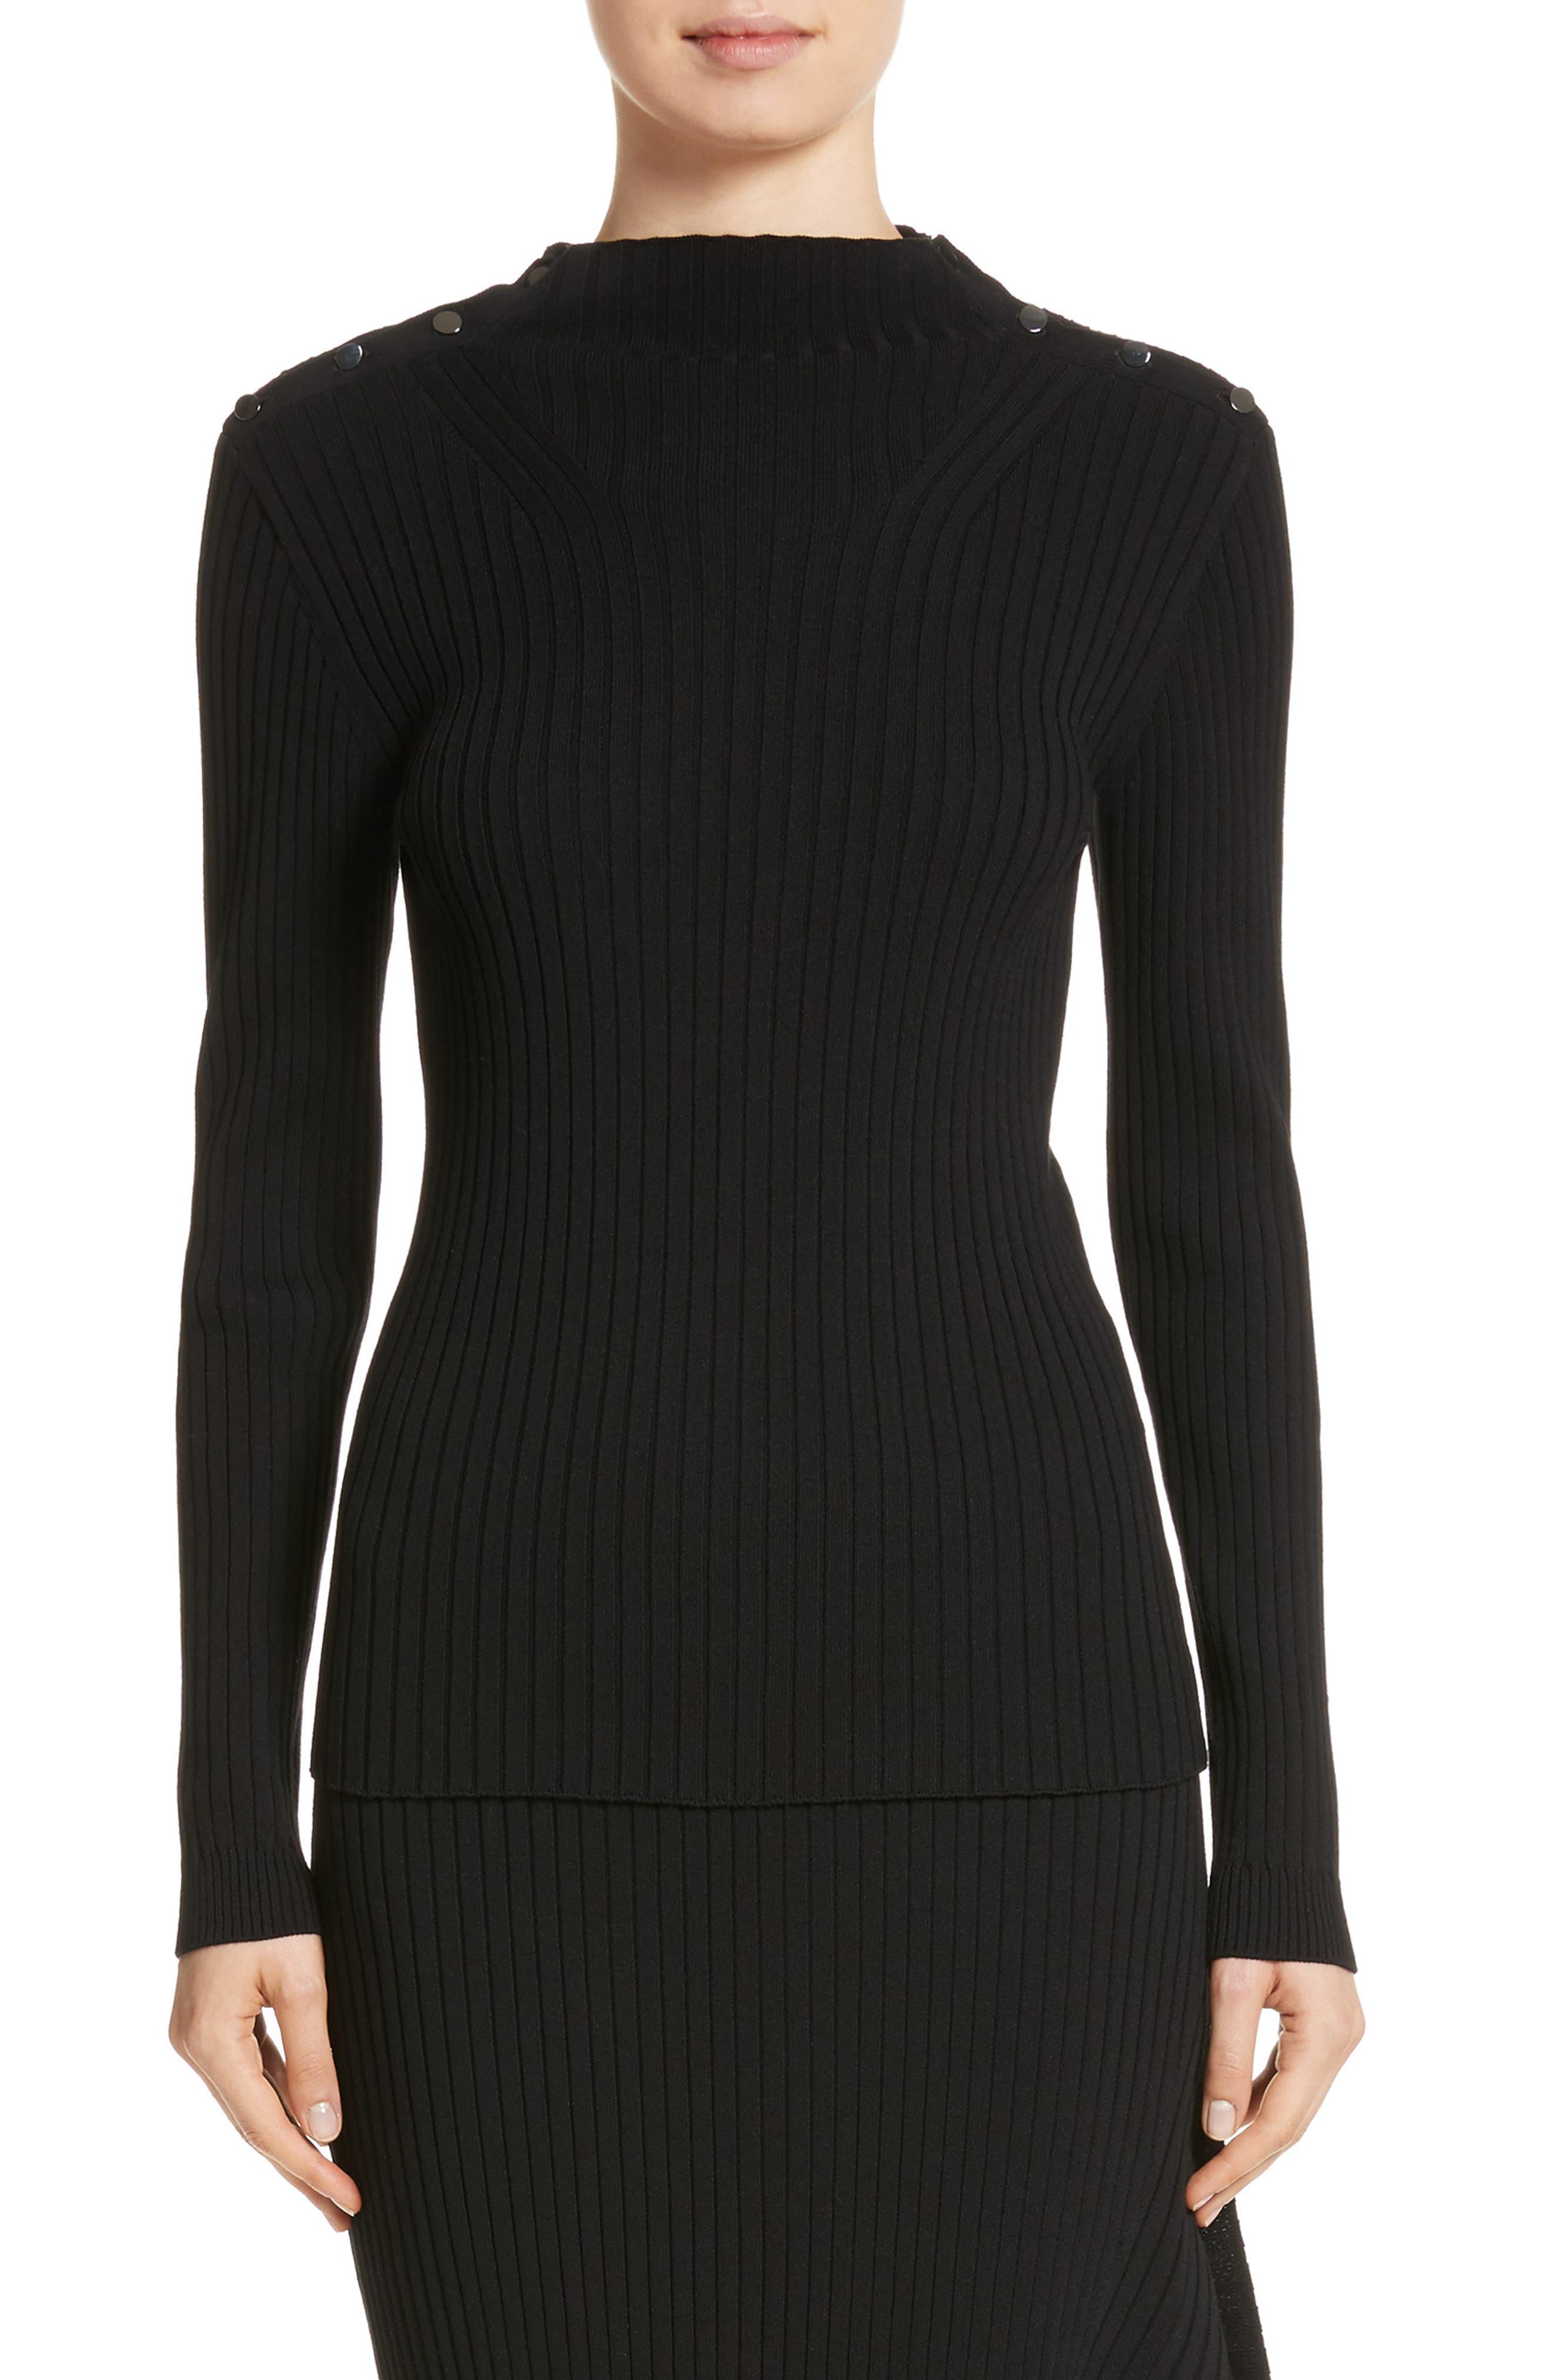 Flat Rib Knit Mock Neck Sweater,                         Main,                         color, Caviar